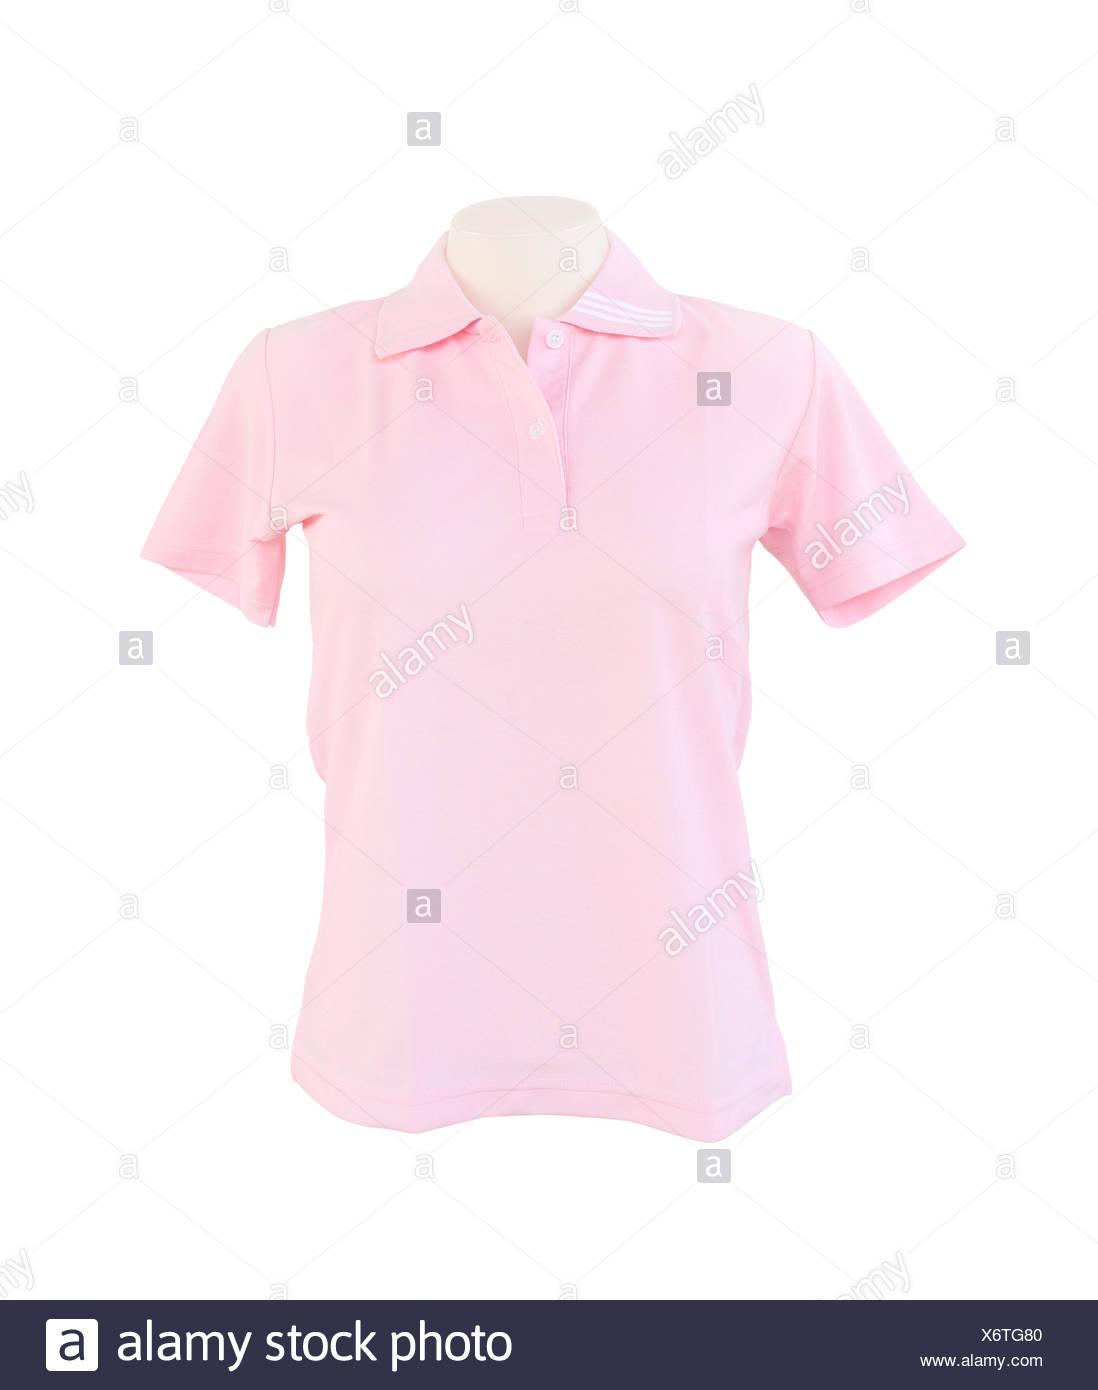 Moderno Plantilla De Camiseta Femenina Composición - Ejemplo De ...